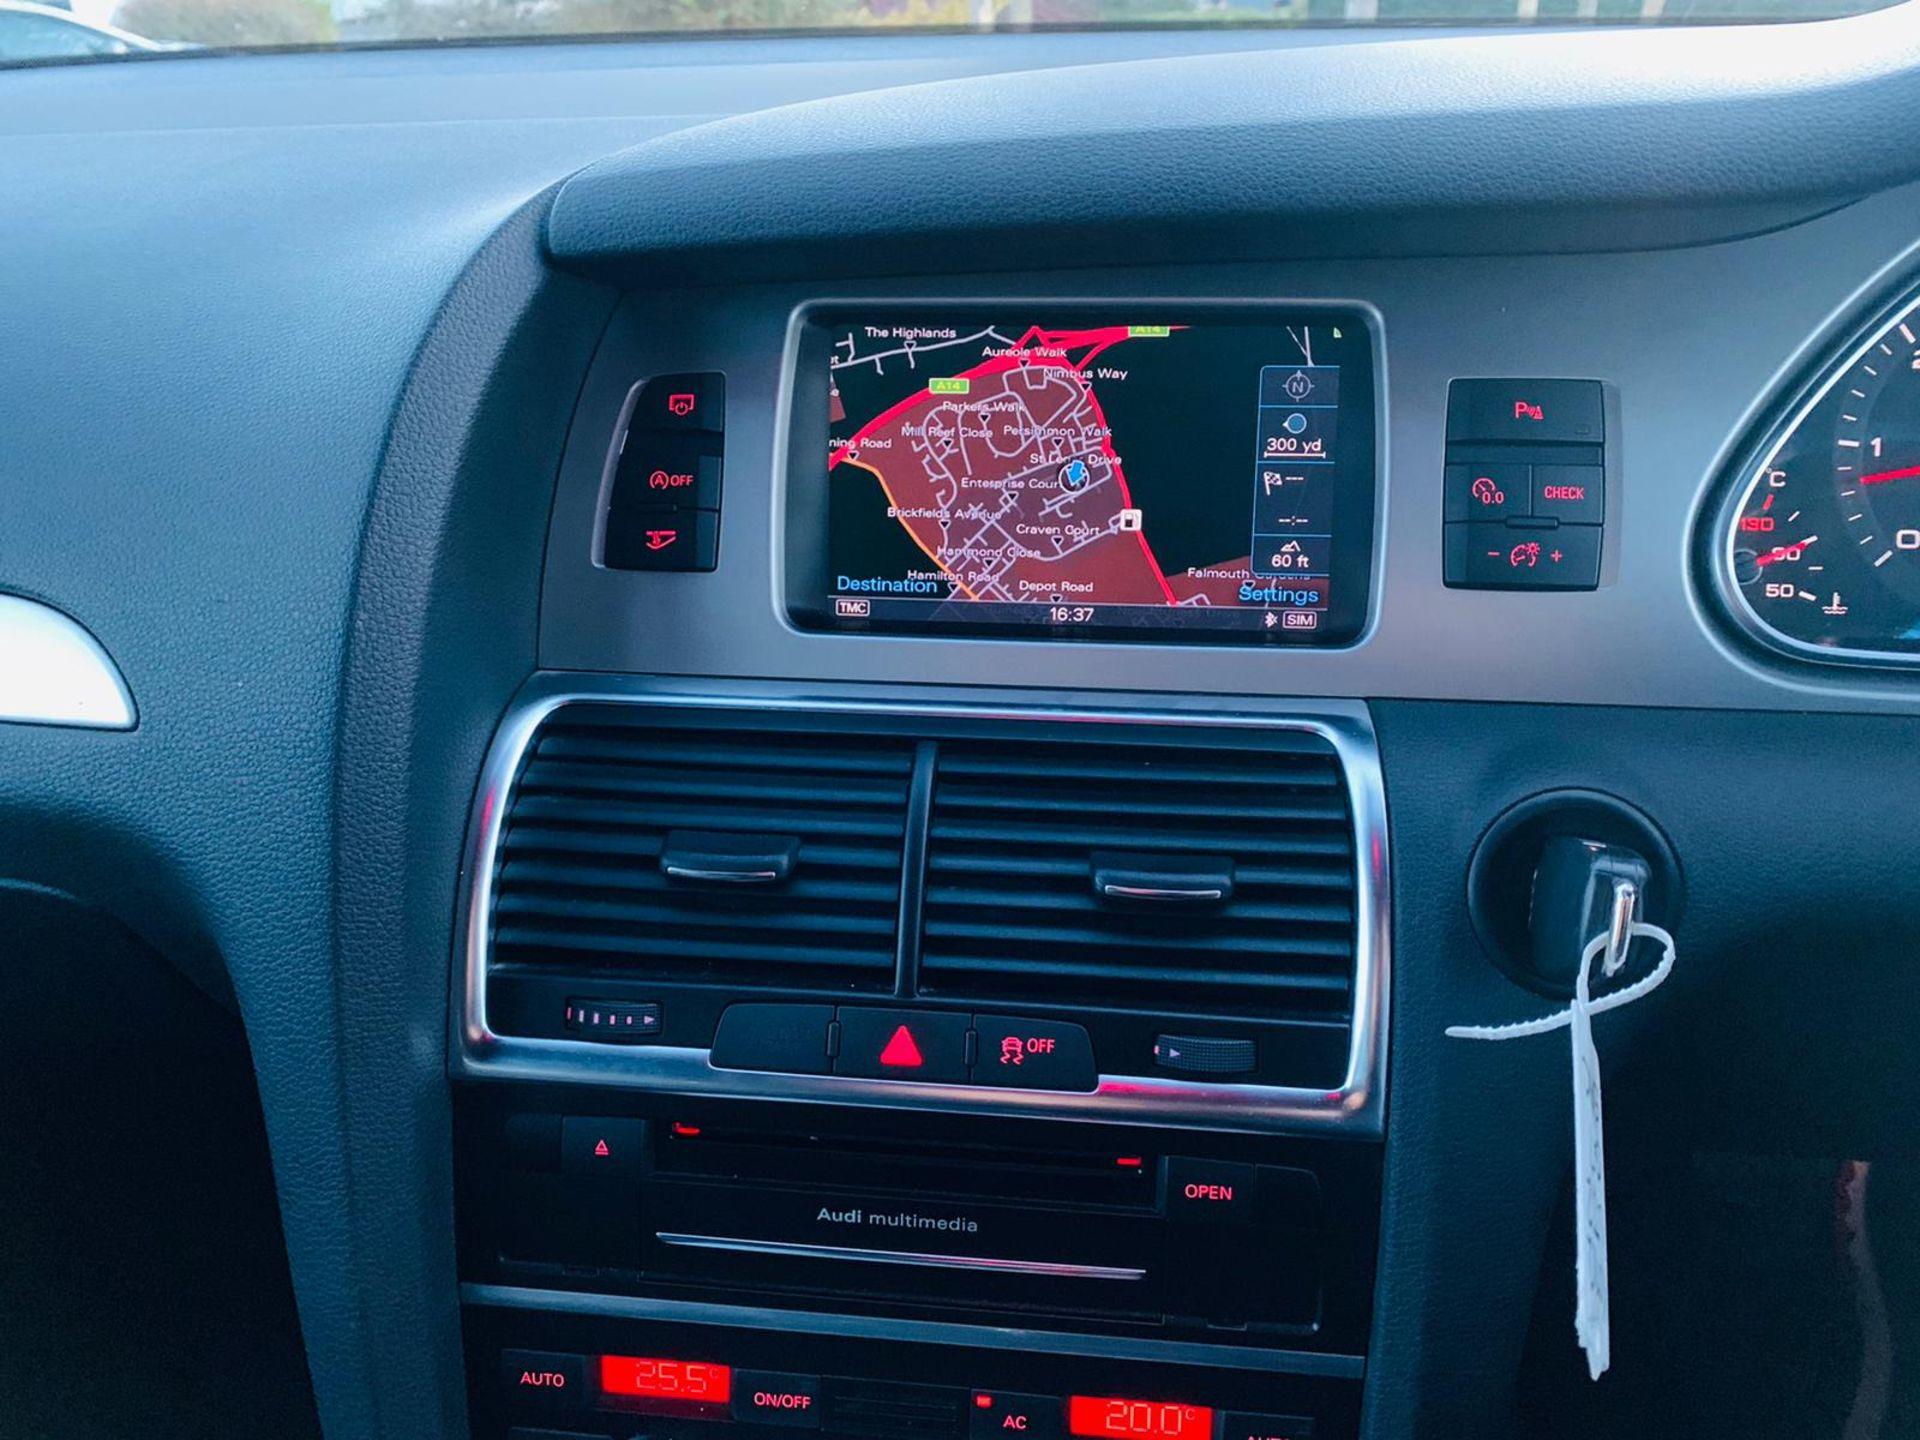 (Reserve Met)Audi Q7 3.0 TDI Quattro S Line Plus Auto (7 Seats) - 12 Reg - Only 63k Miles -Sat Nav- - Image 25 of 37